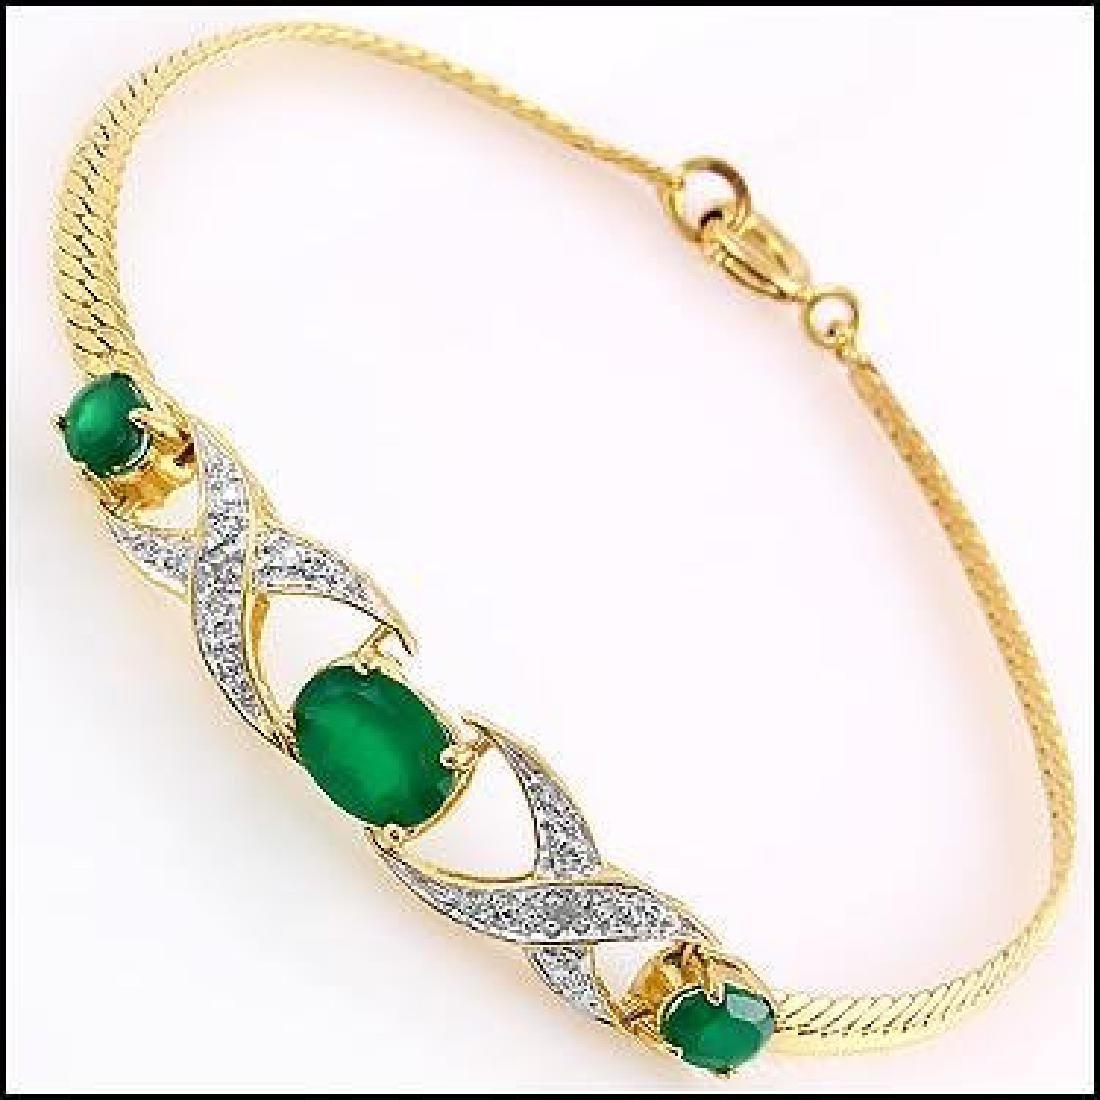 4.7 CT Green Agate Diamond Bracelet